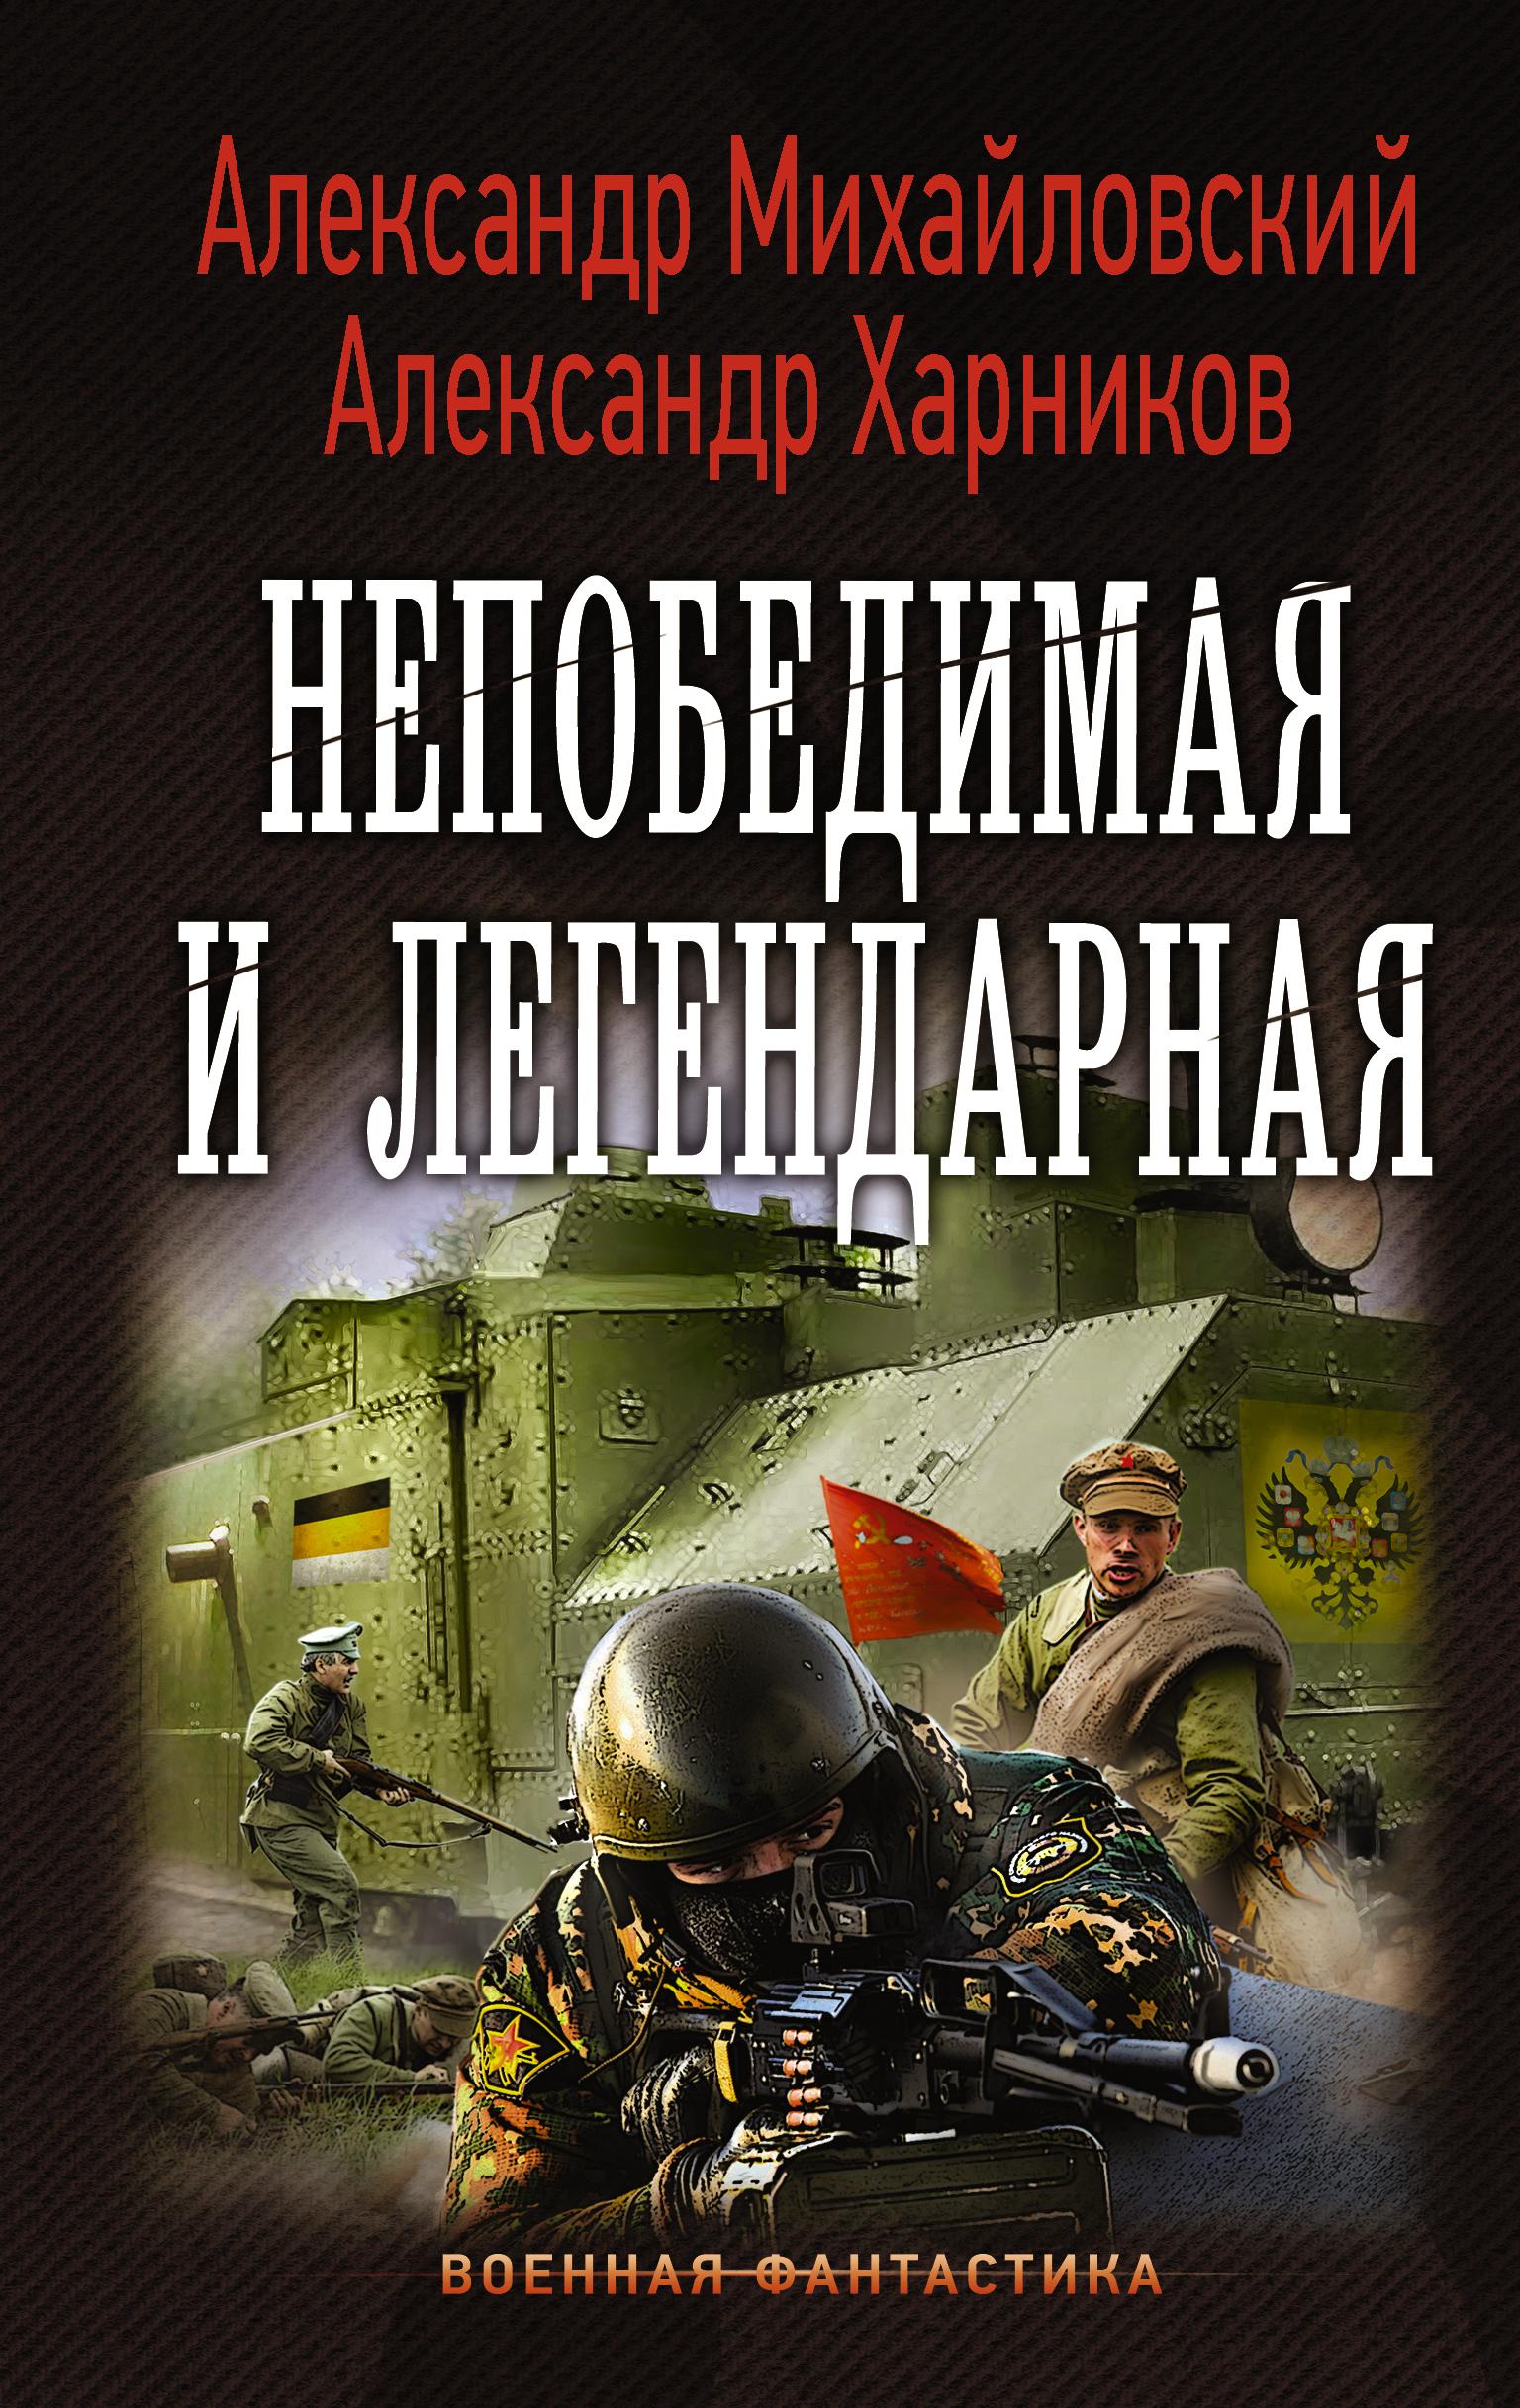 Александр Михайловский, Александр Харников Непобедимая и легендарная